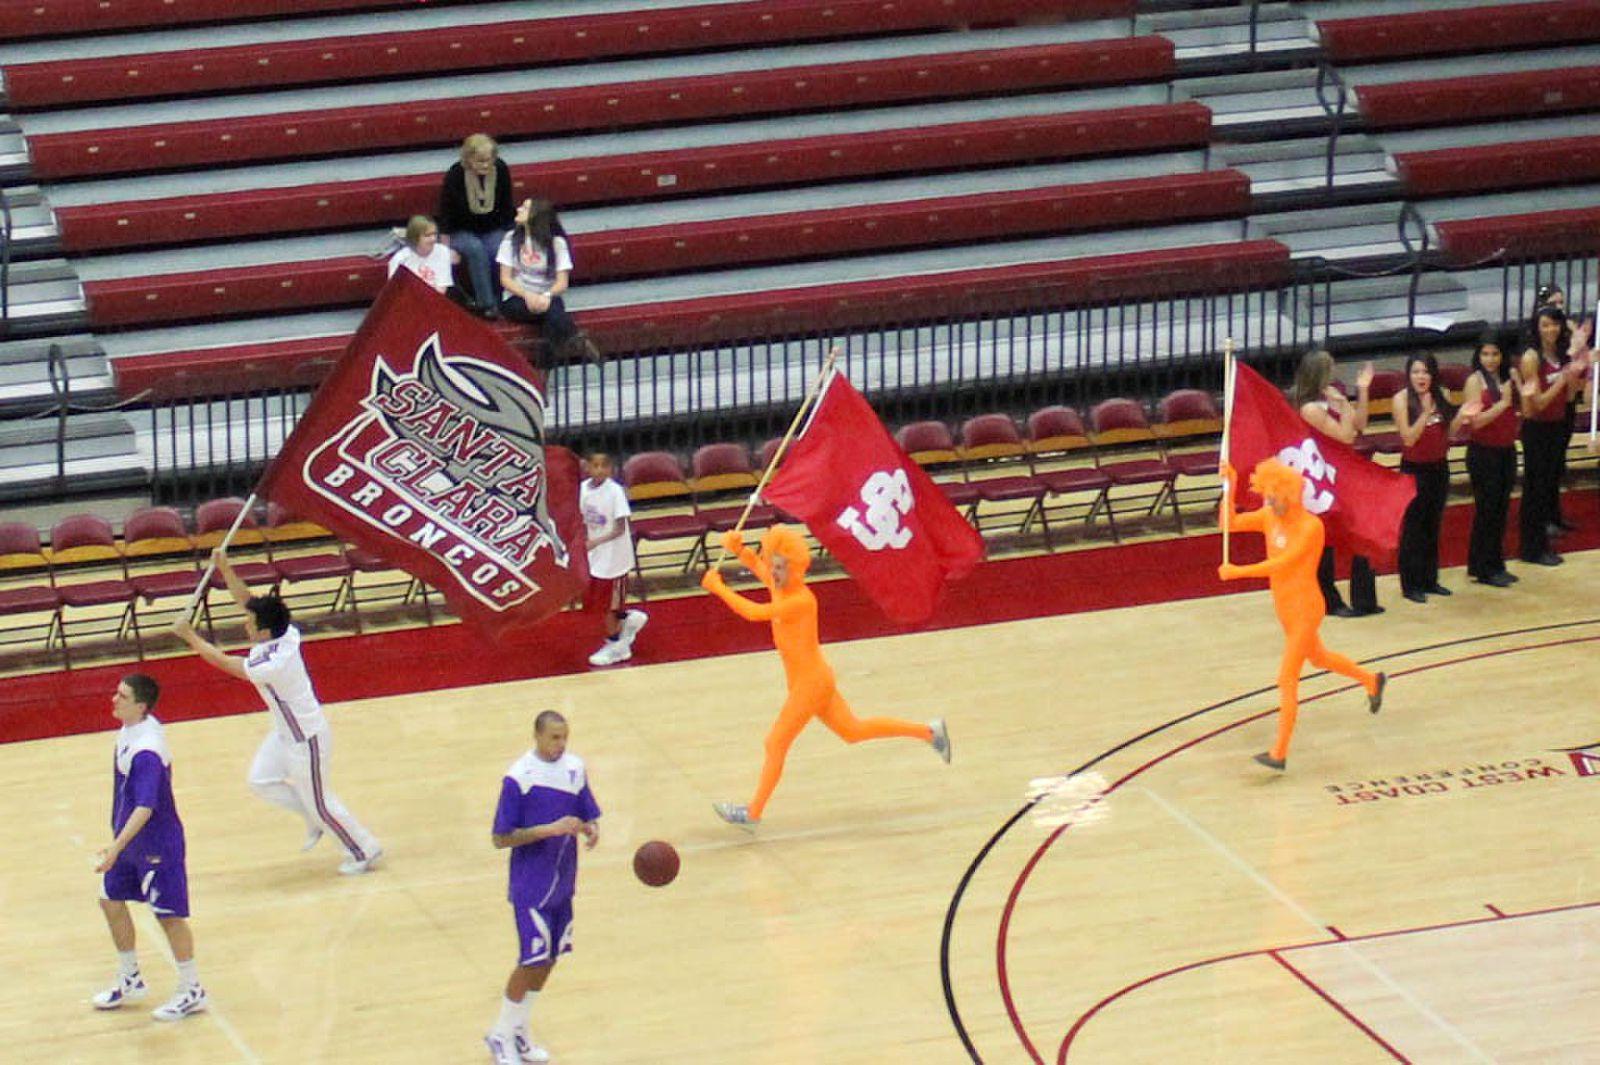 Egnyte Night with the Santa Clara University Broncos - Egnyte Blog